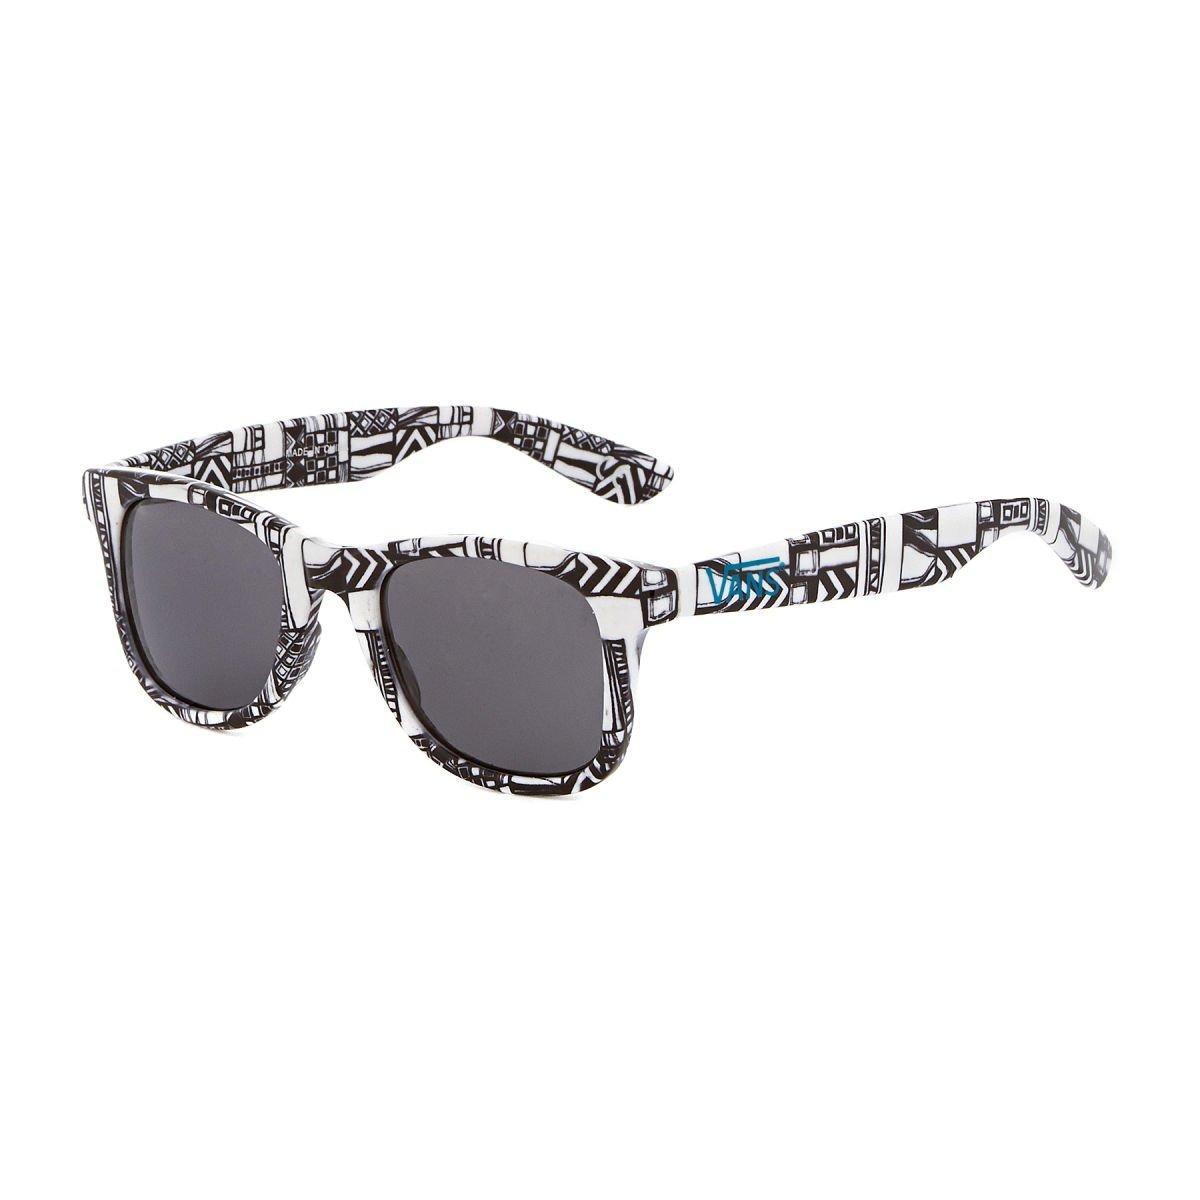 4f497f522ab1 Cheap Vans Sunglasses, find Vans Sunglasses deals on line at Alibaba.com